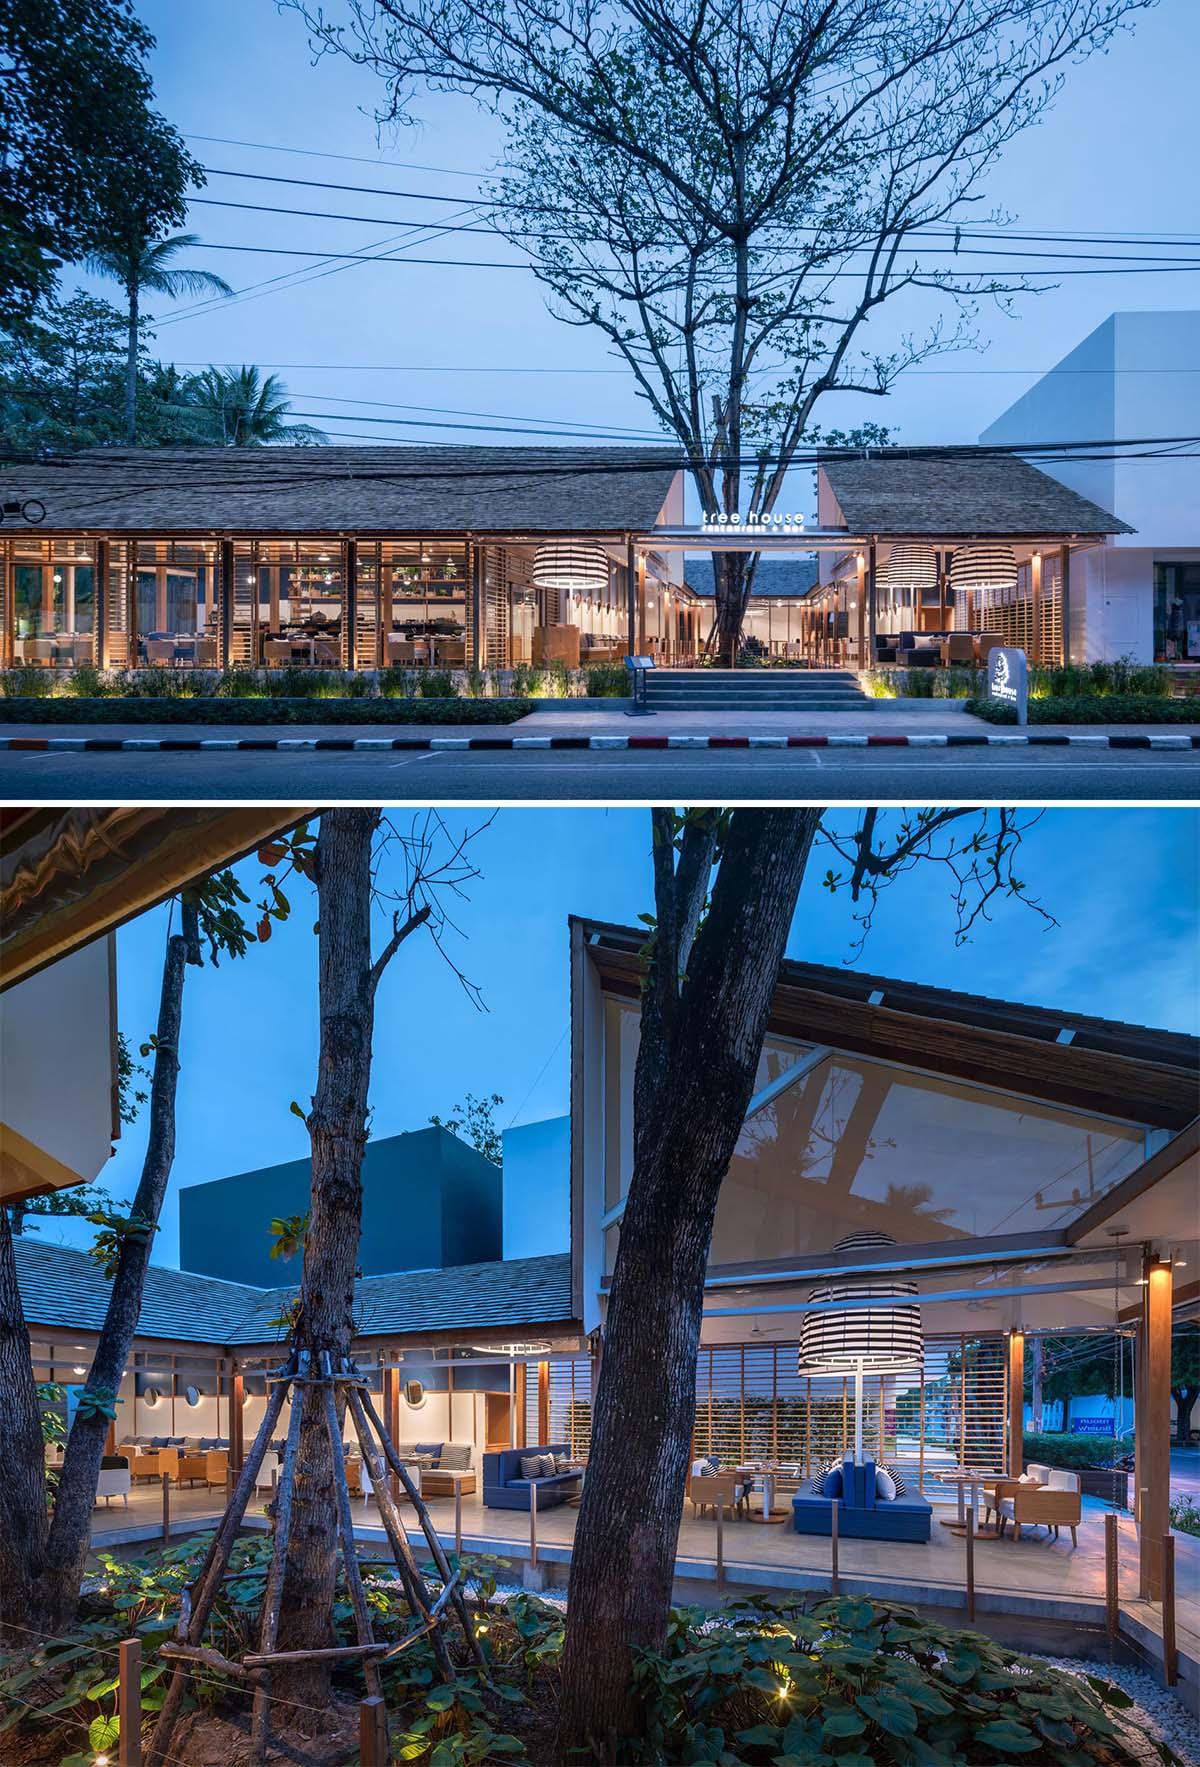 A modern restaurant hotel with glass walls.